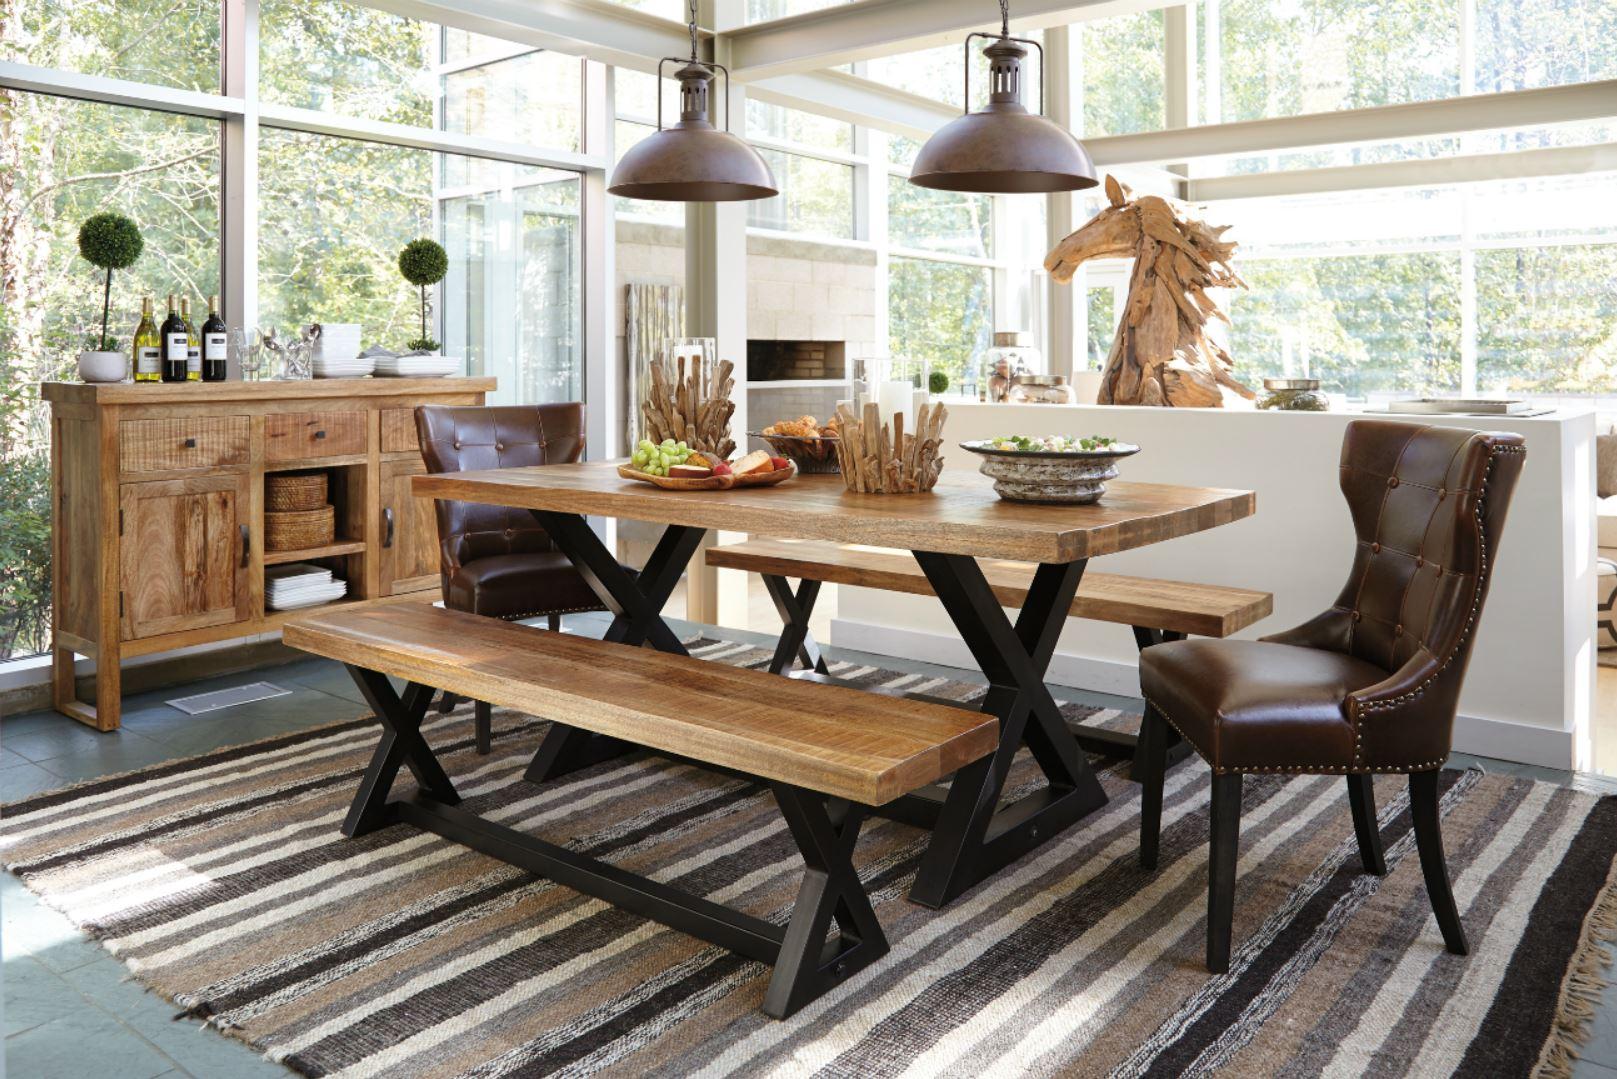 repurpose dining room | 5 Ways to Repurpose Your Dining Room